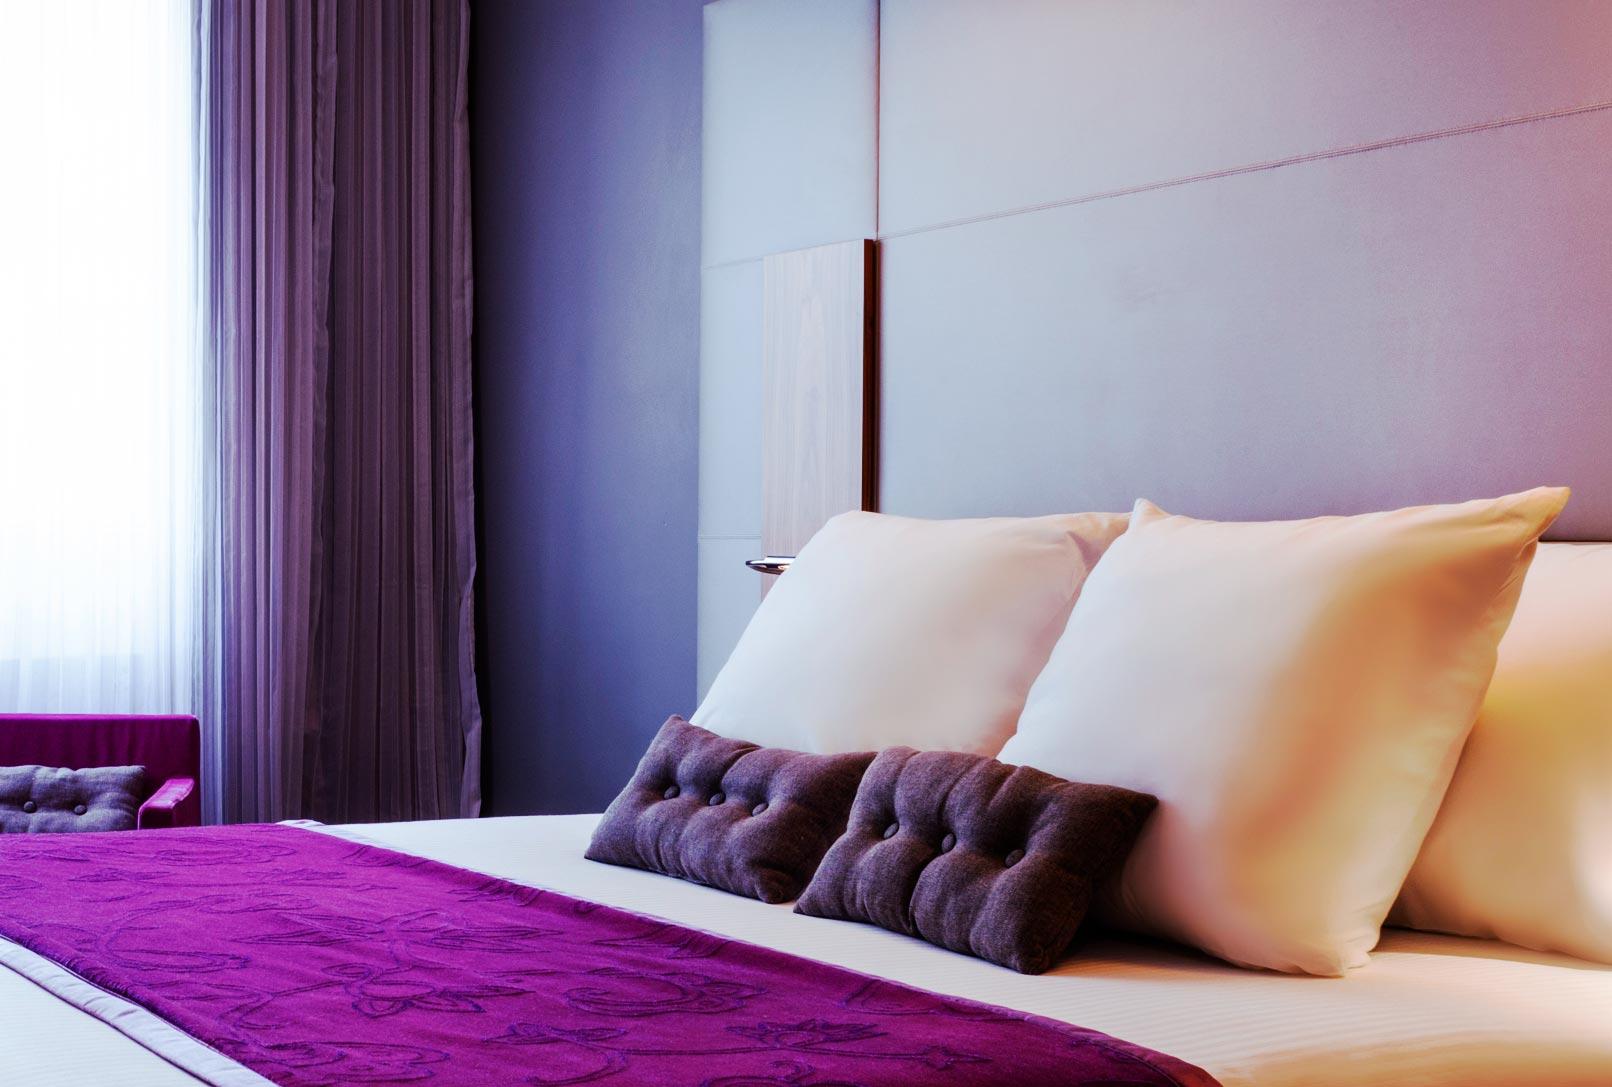 offres sp ciales h tel etoile saint honor. Black Bedroom Furniture Sets. Home Design Ideas